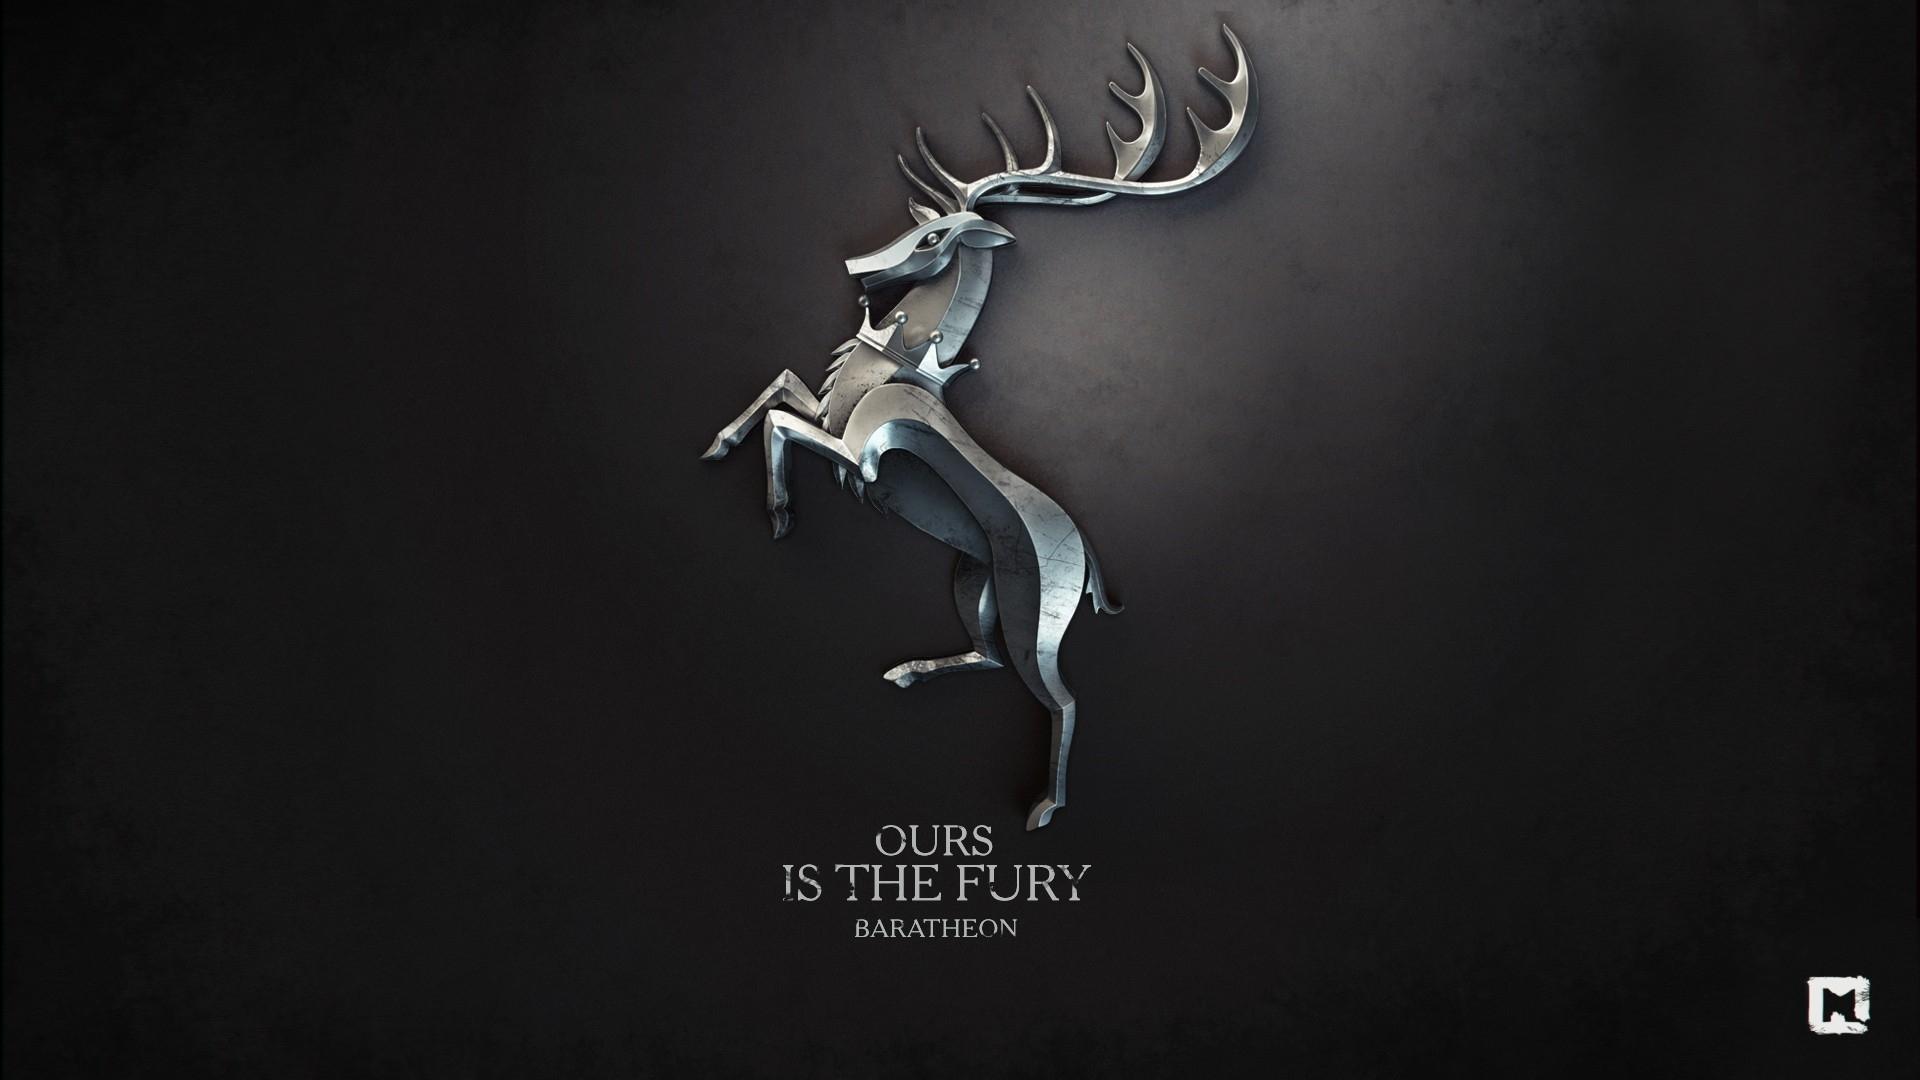 baratheon games of thrones wallpaper | movies to watch | pinterest